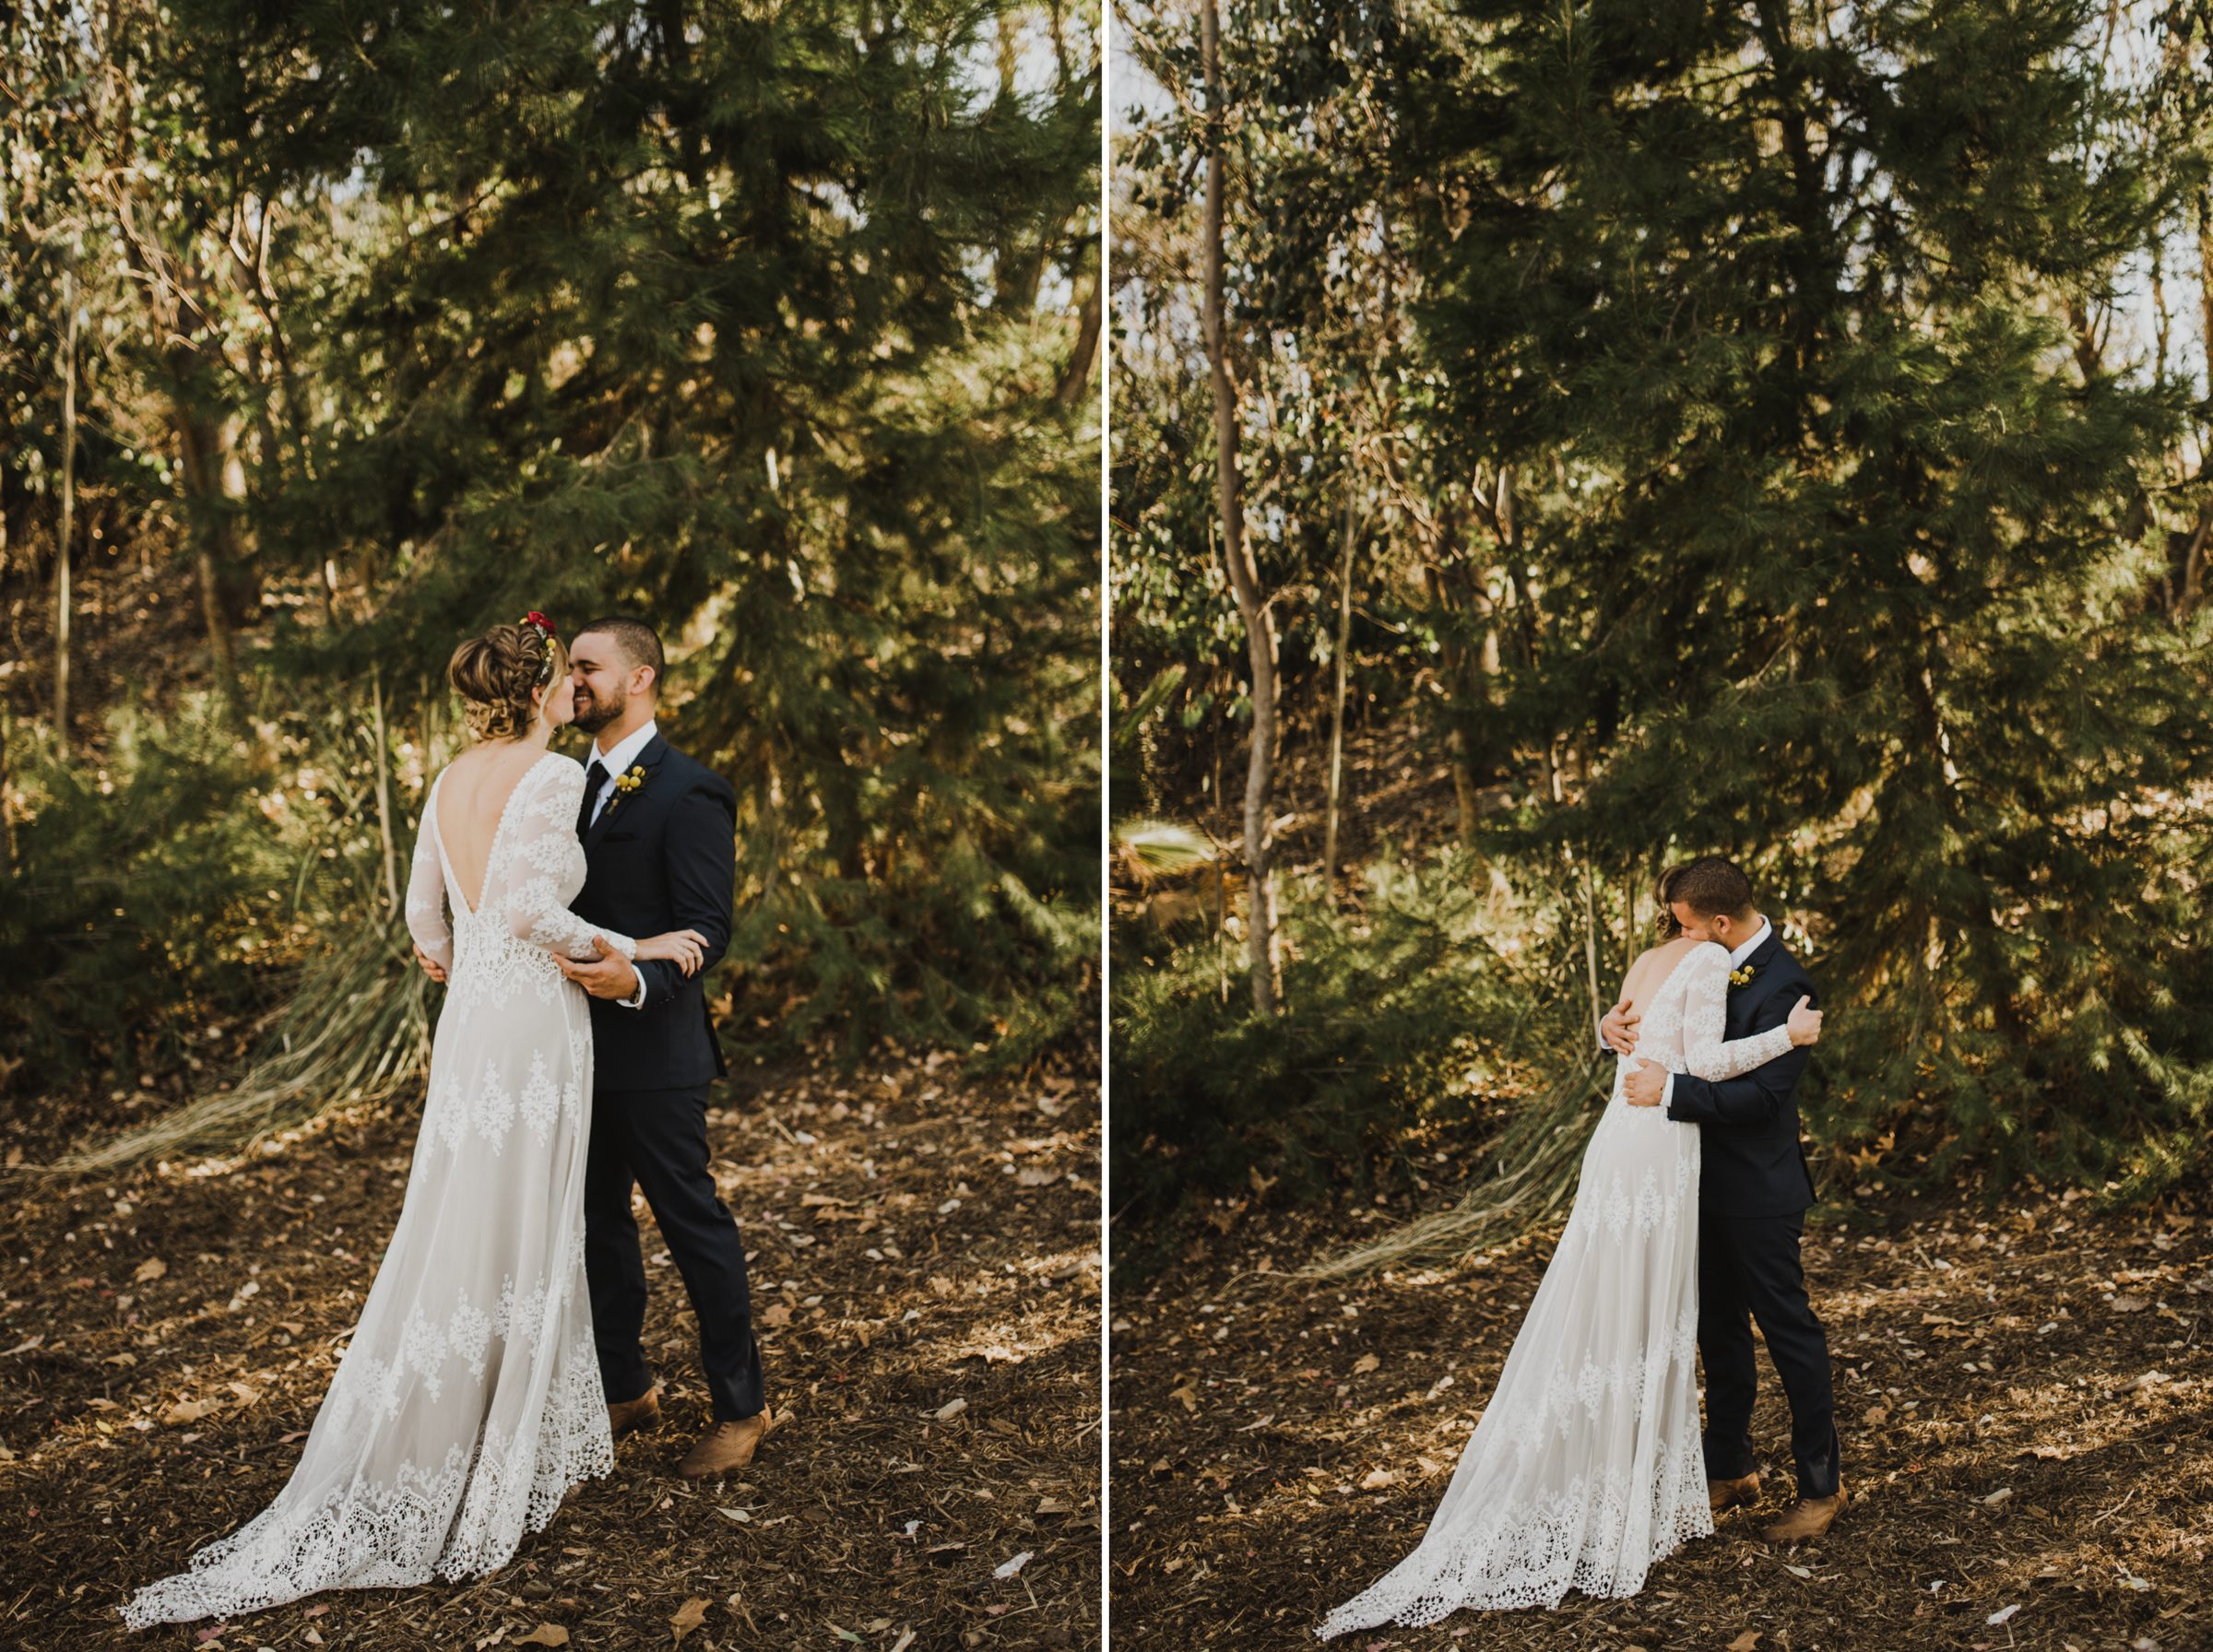 ©Isaiah + Taylor Photography - The Woodshed Booze Brothers Wedding, Vista California Wedding Photographer-30.jpg